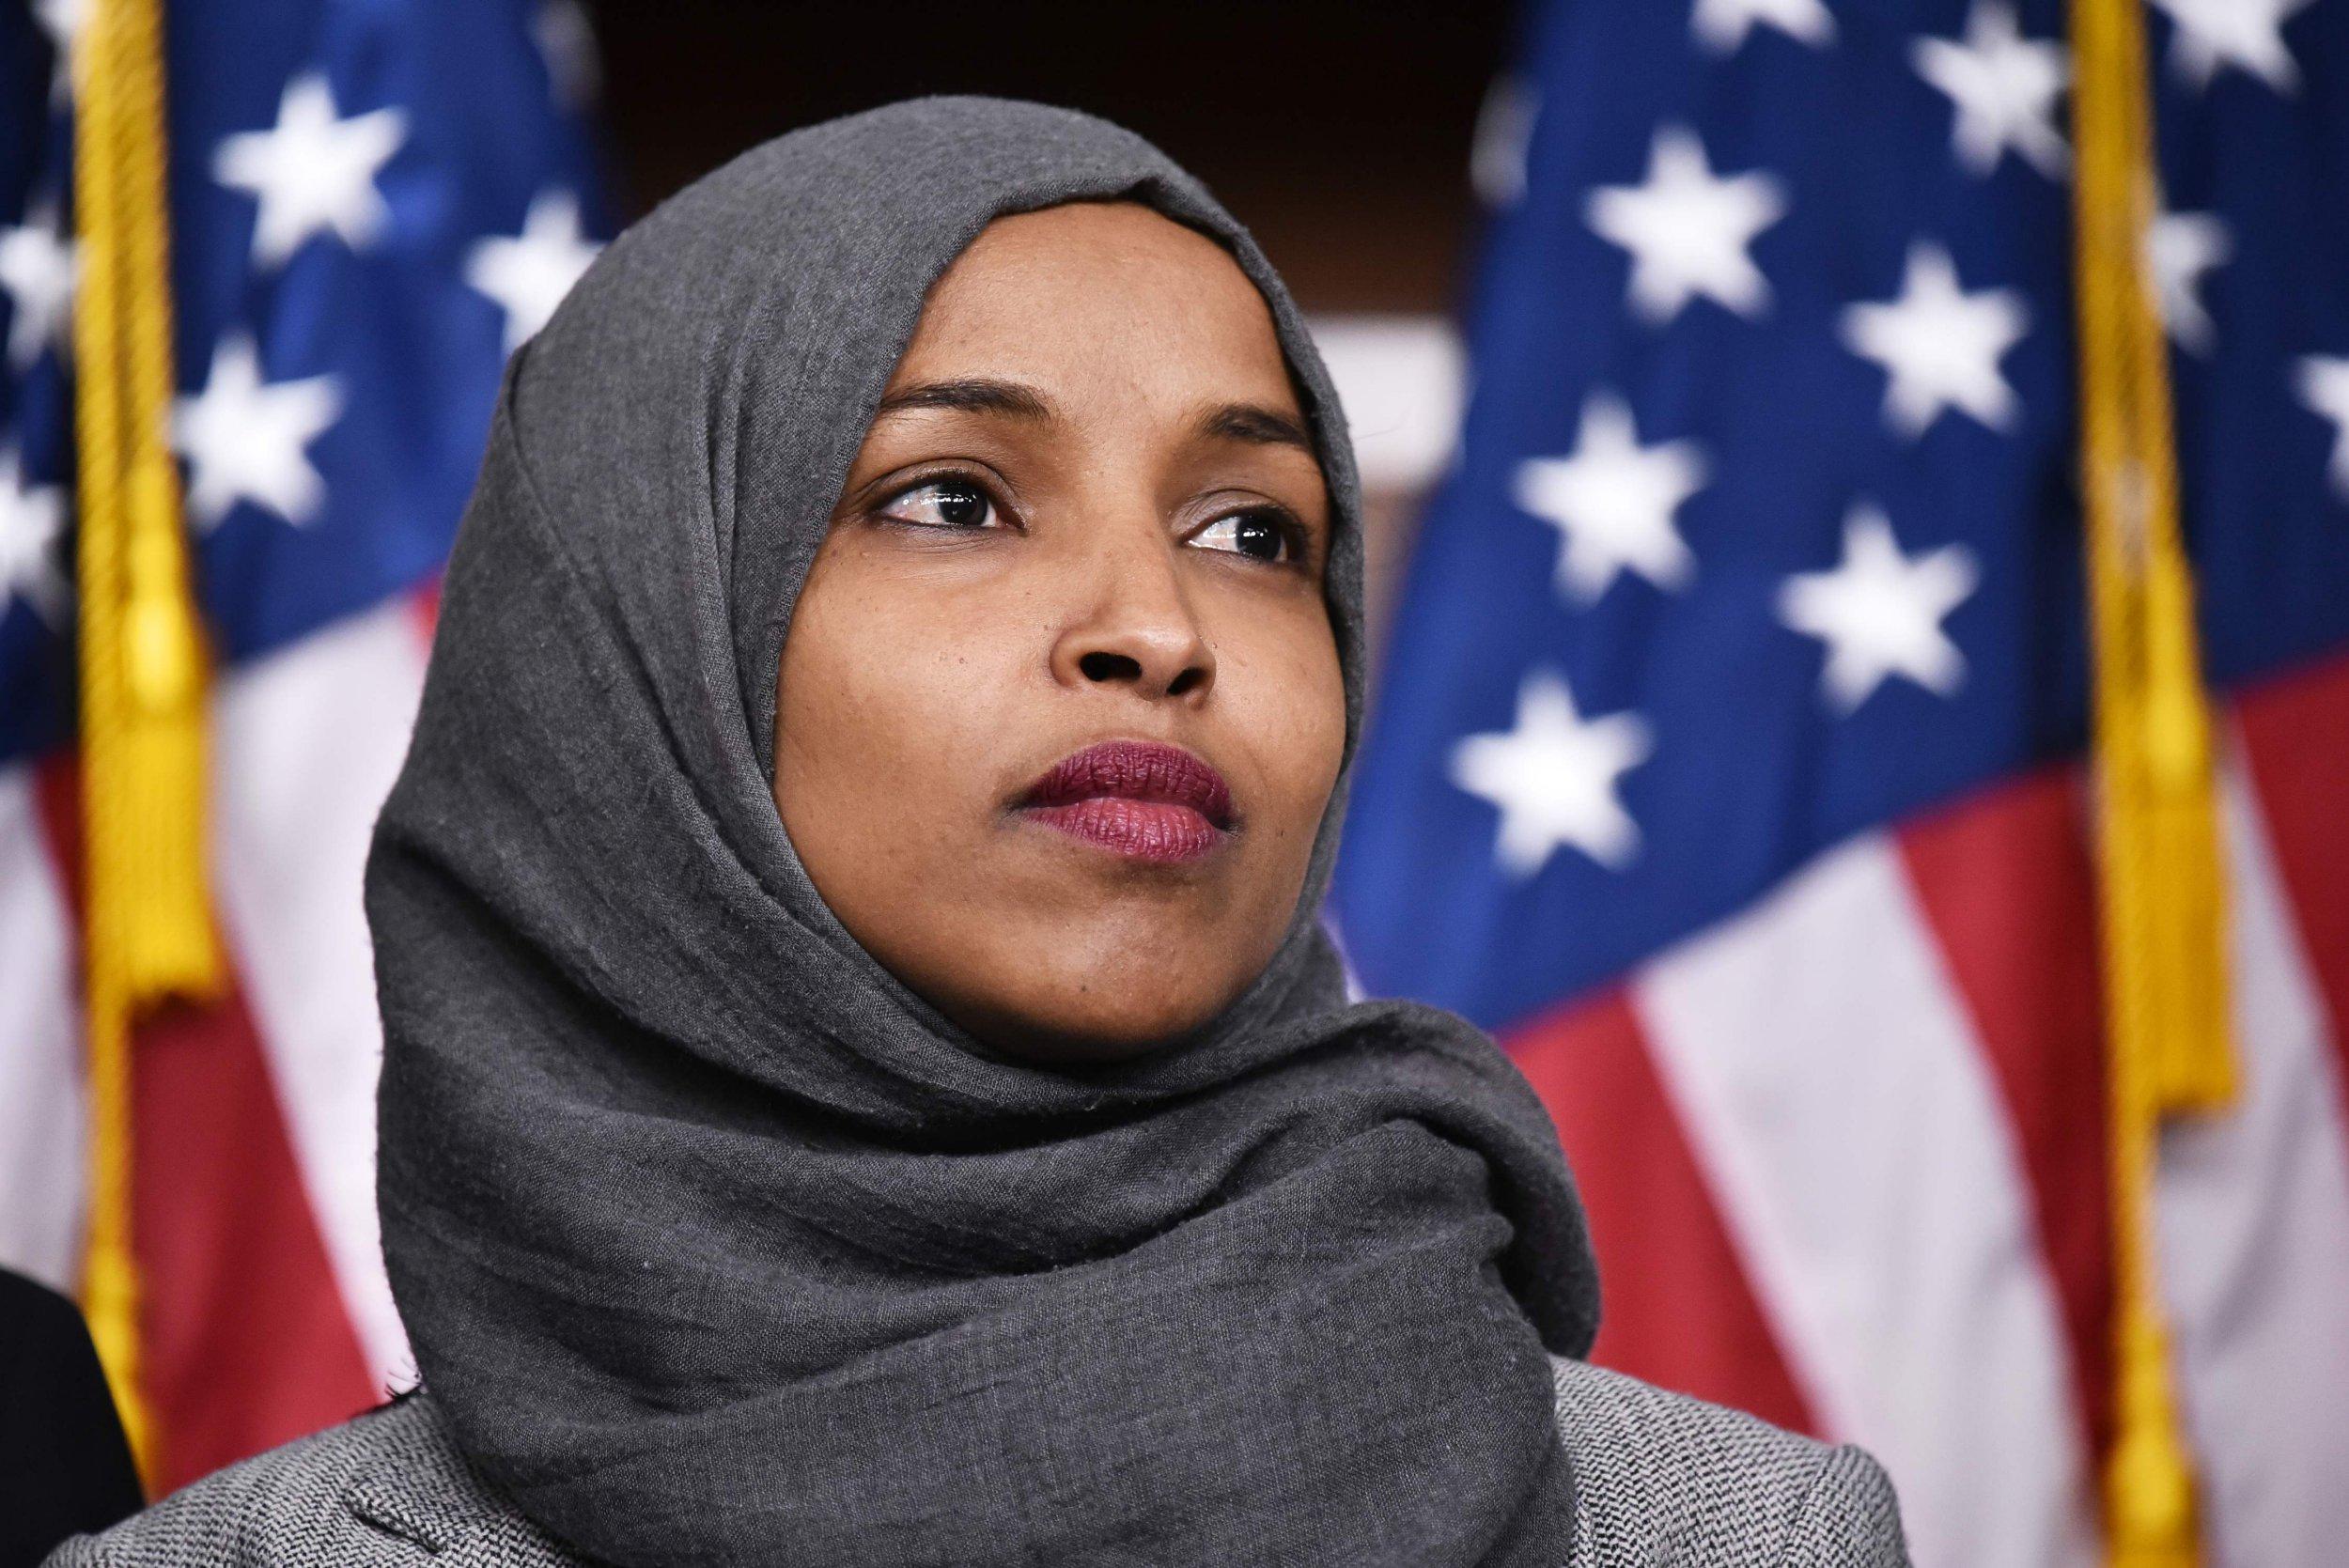 Donald Trump targets Muslim congresswoman with graphic 9/11 video